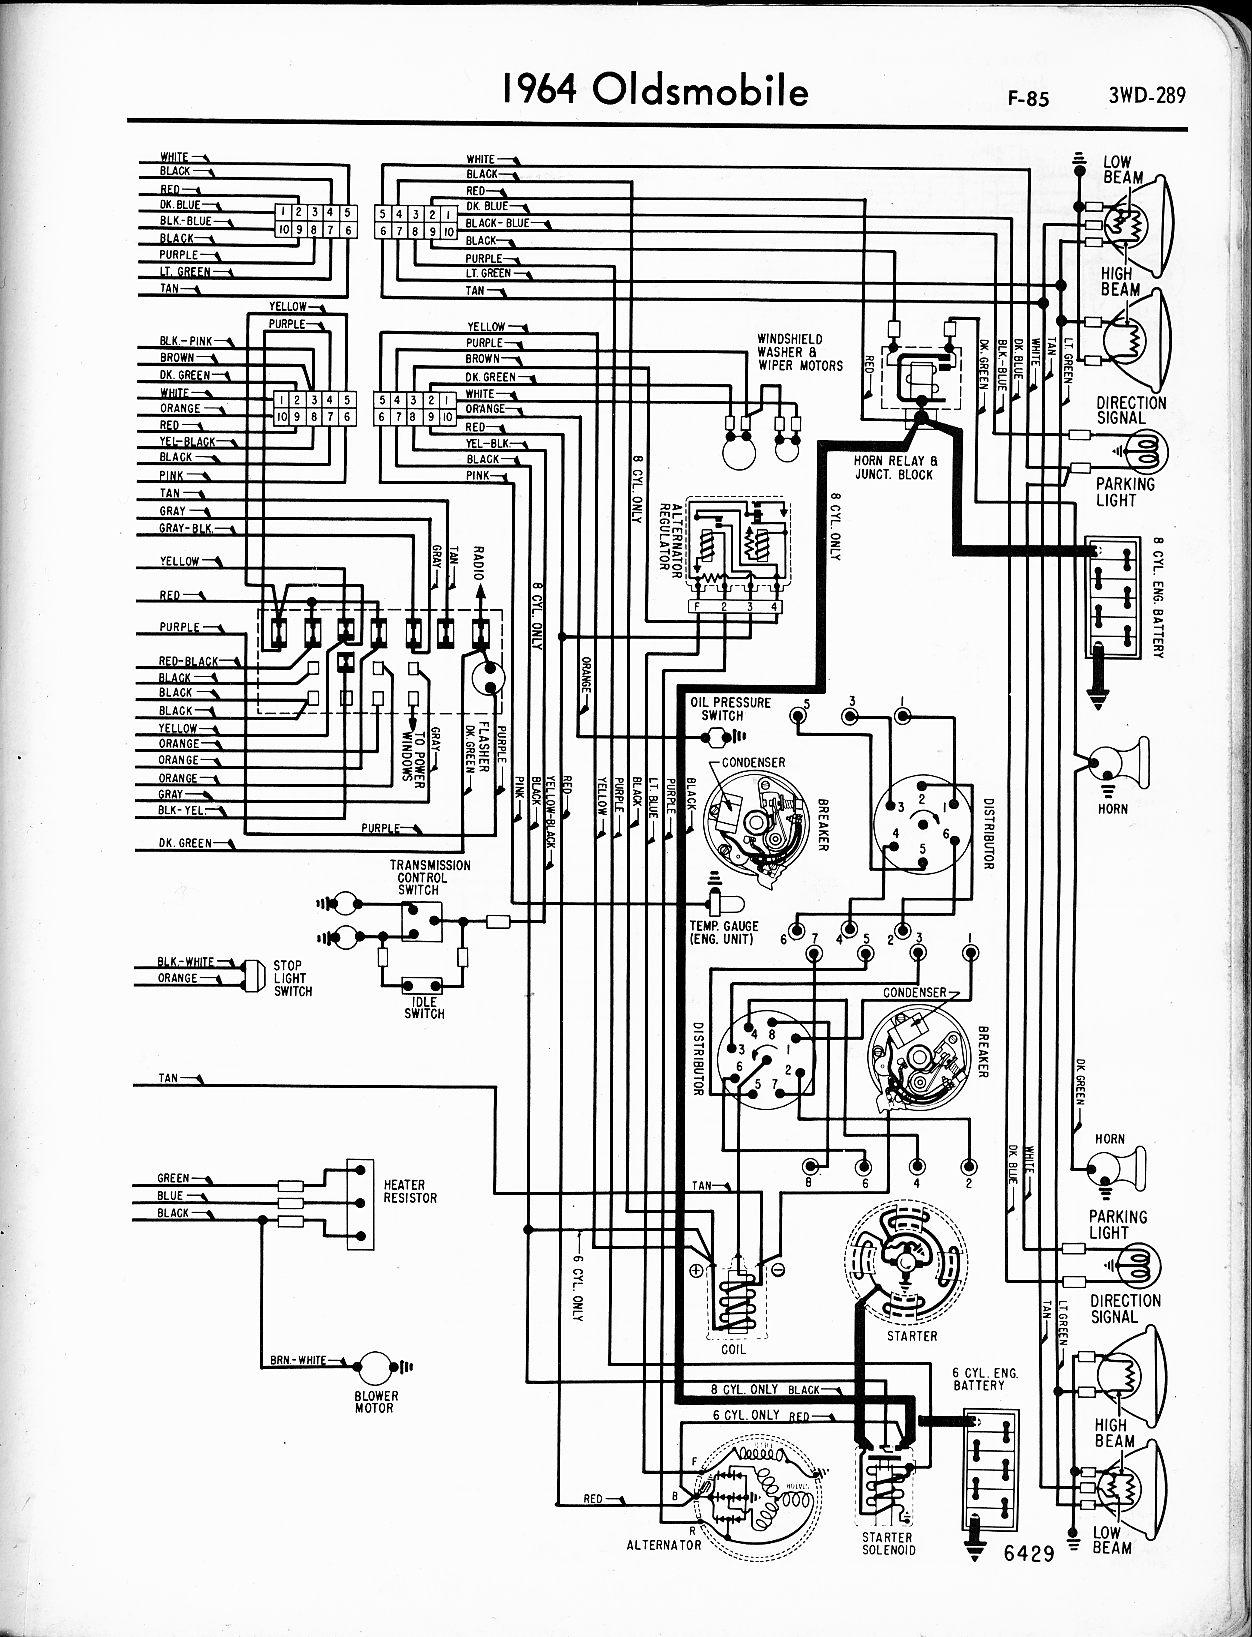 Old Car Fuse Box Repair Parts Auto Electrical Wiring Diagram Oldsmobile Diagrams Automotive